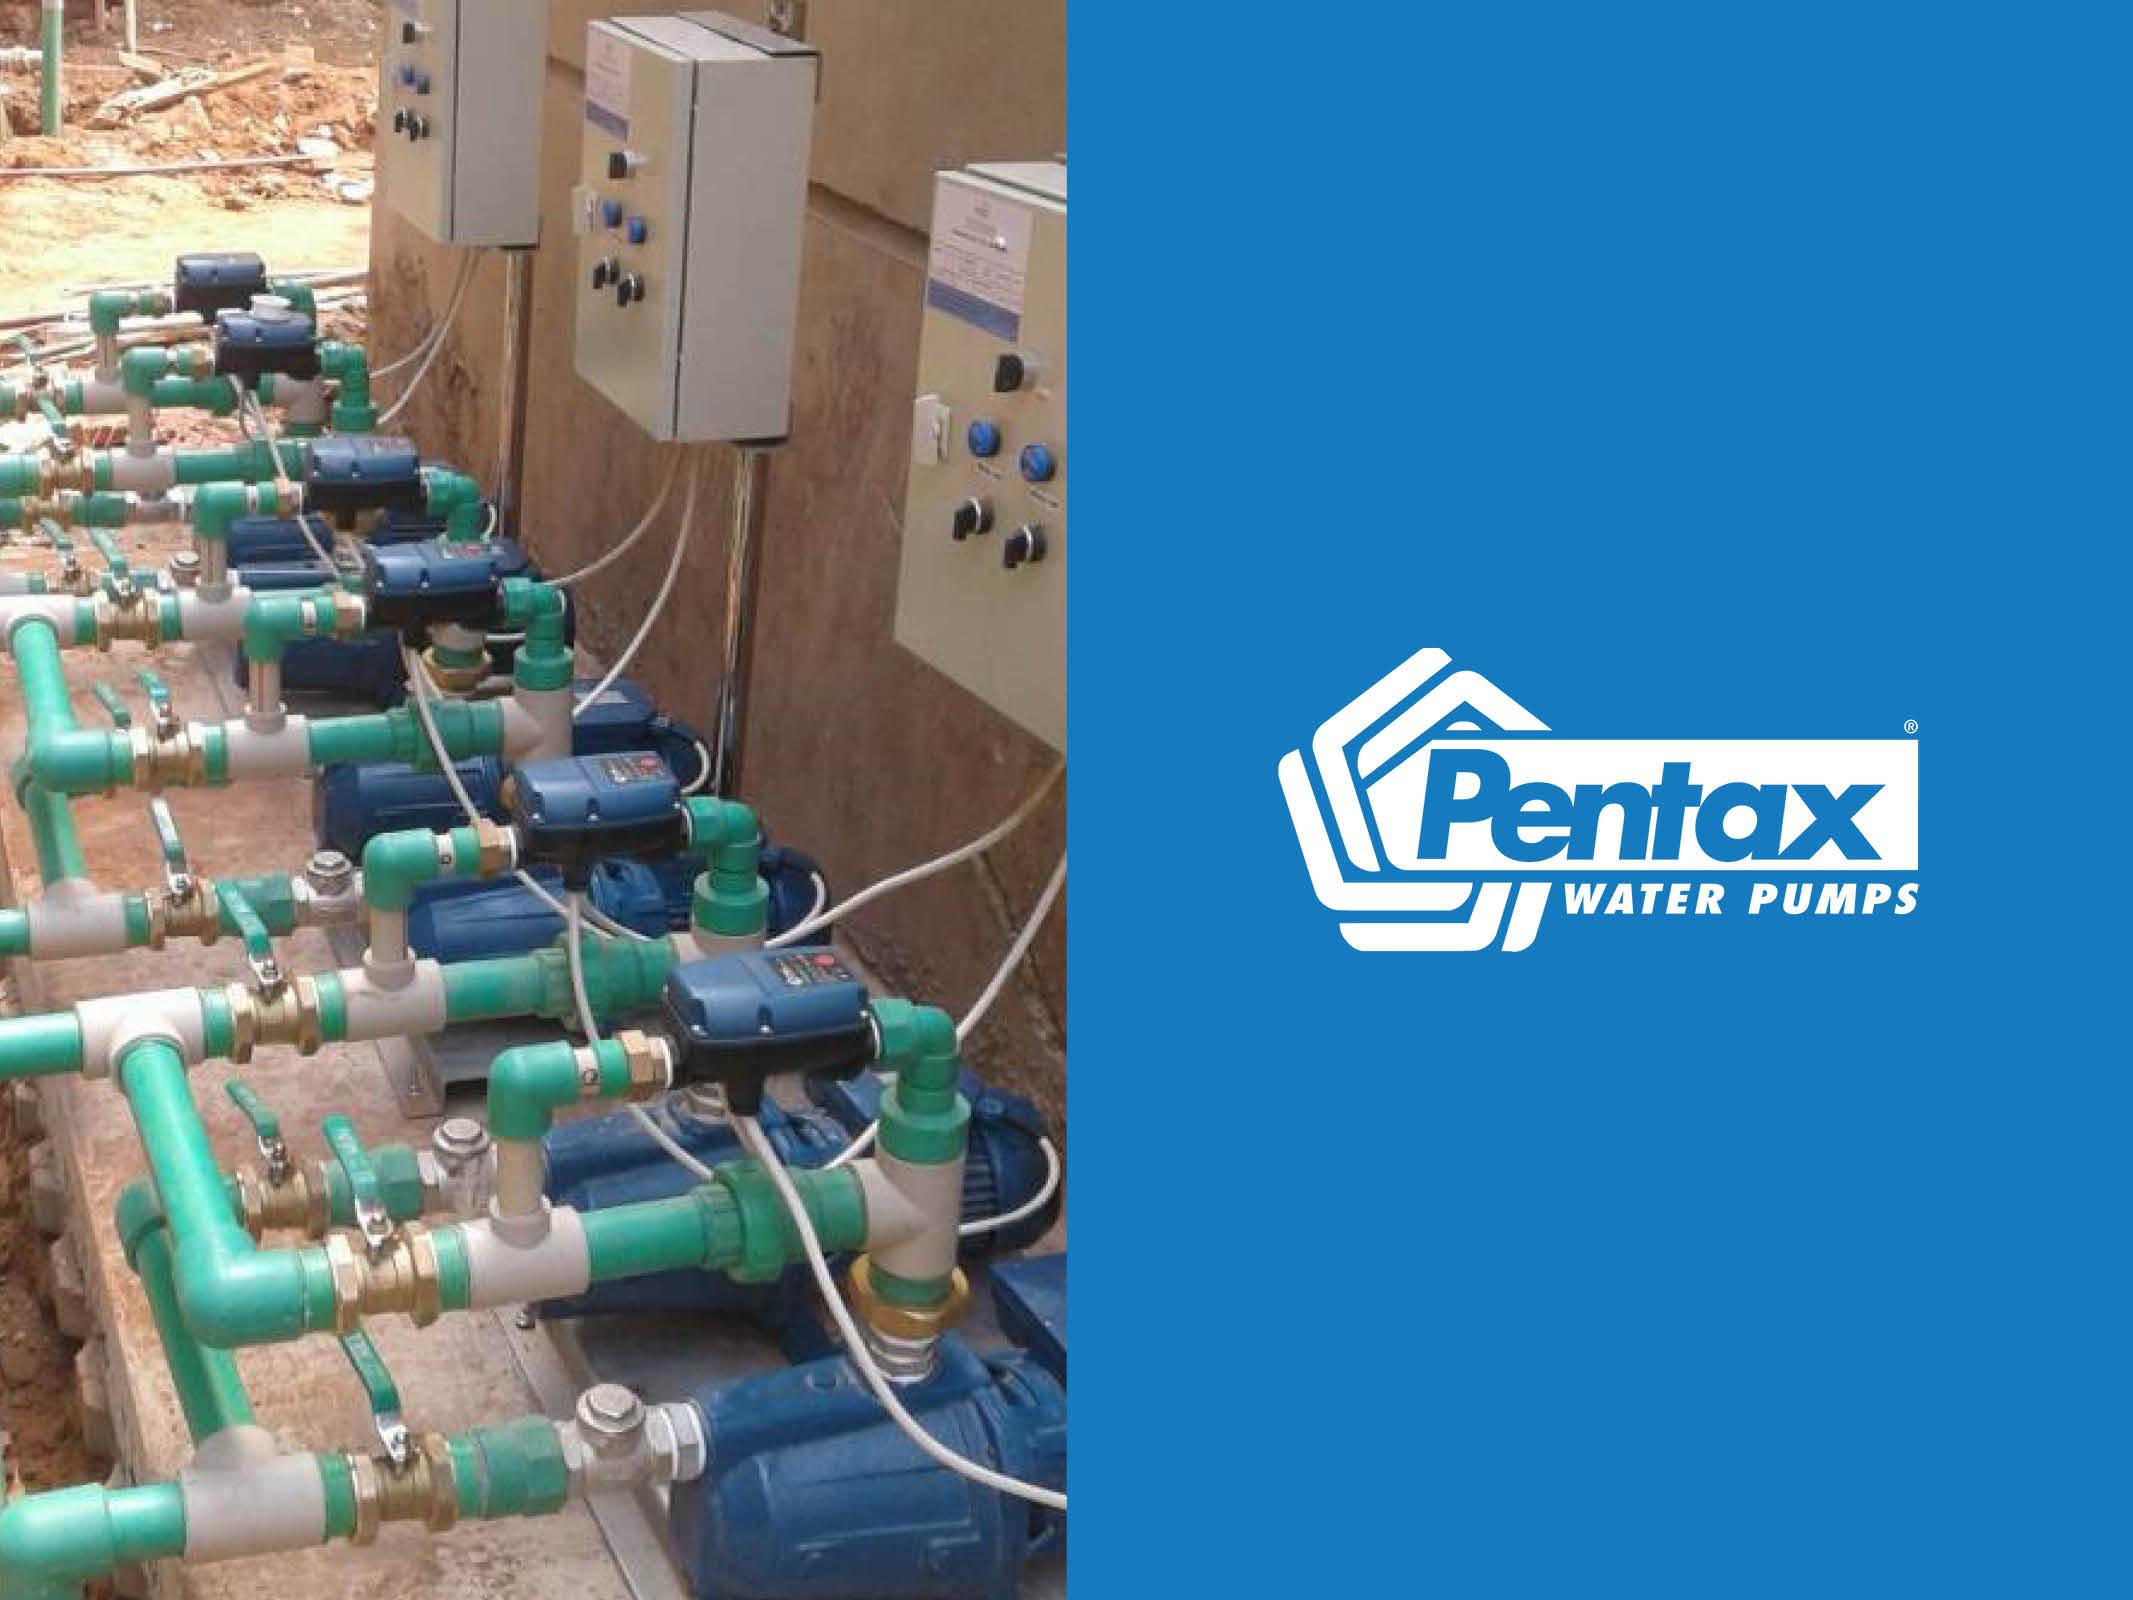 https://www.pentax-pumps.it/pentax/wp-content/uploads/sites/5/2020/11/Sudanese-presidential-palace-1.jpg